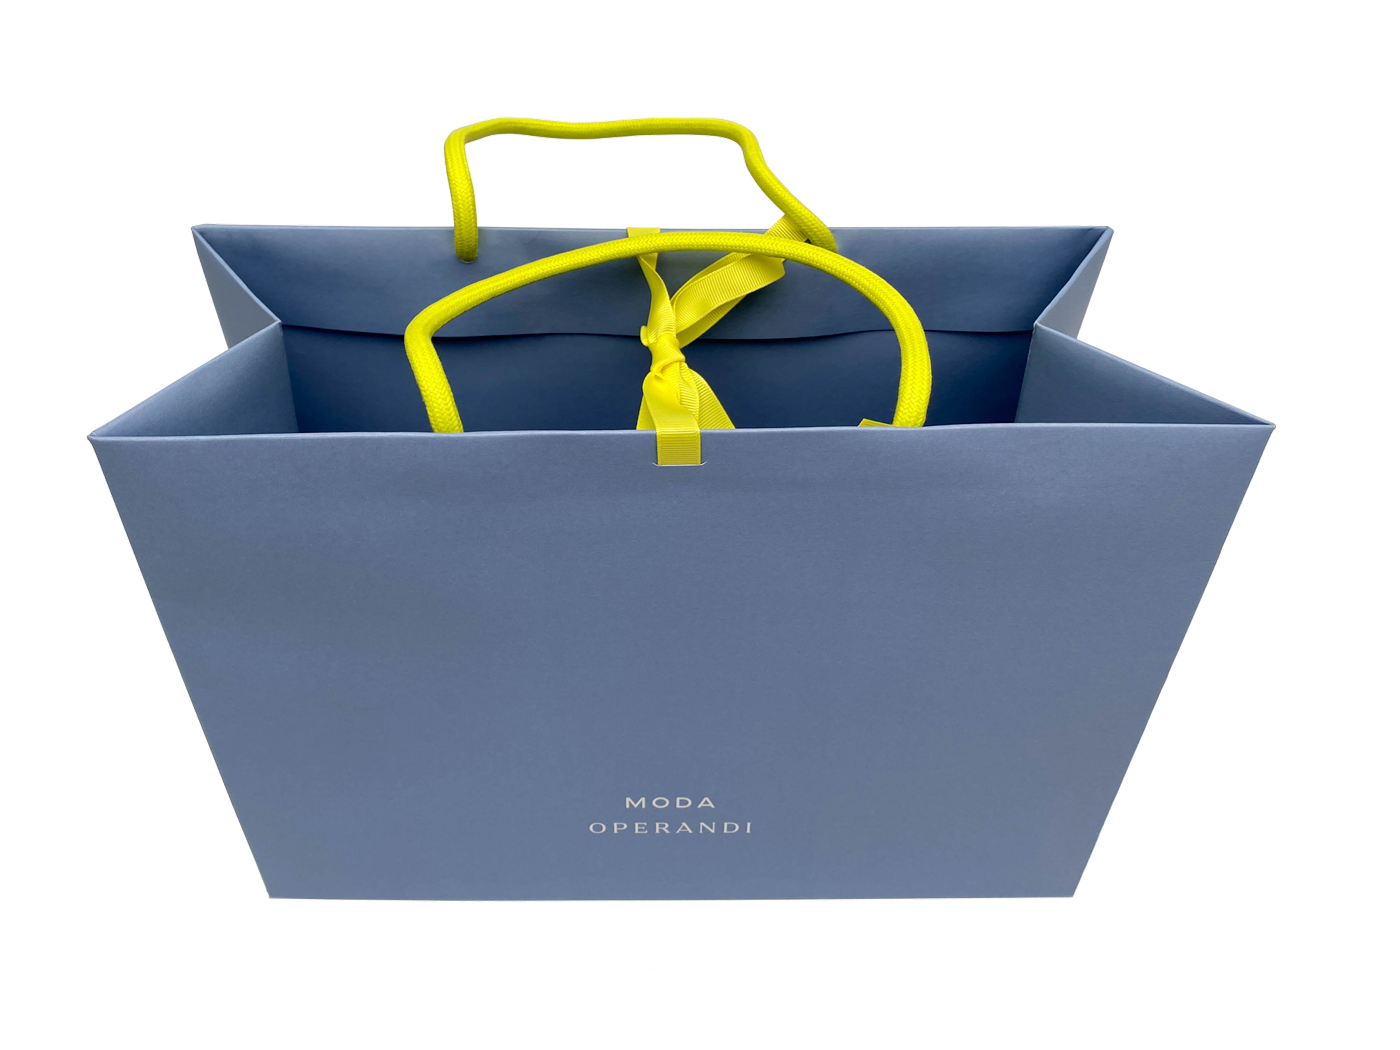 Custom Printed Retail Shopping Bags & Packaging - shopping bags: Moda Operandi